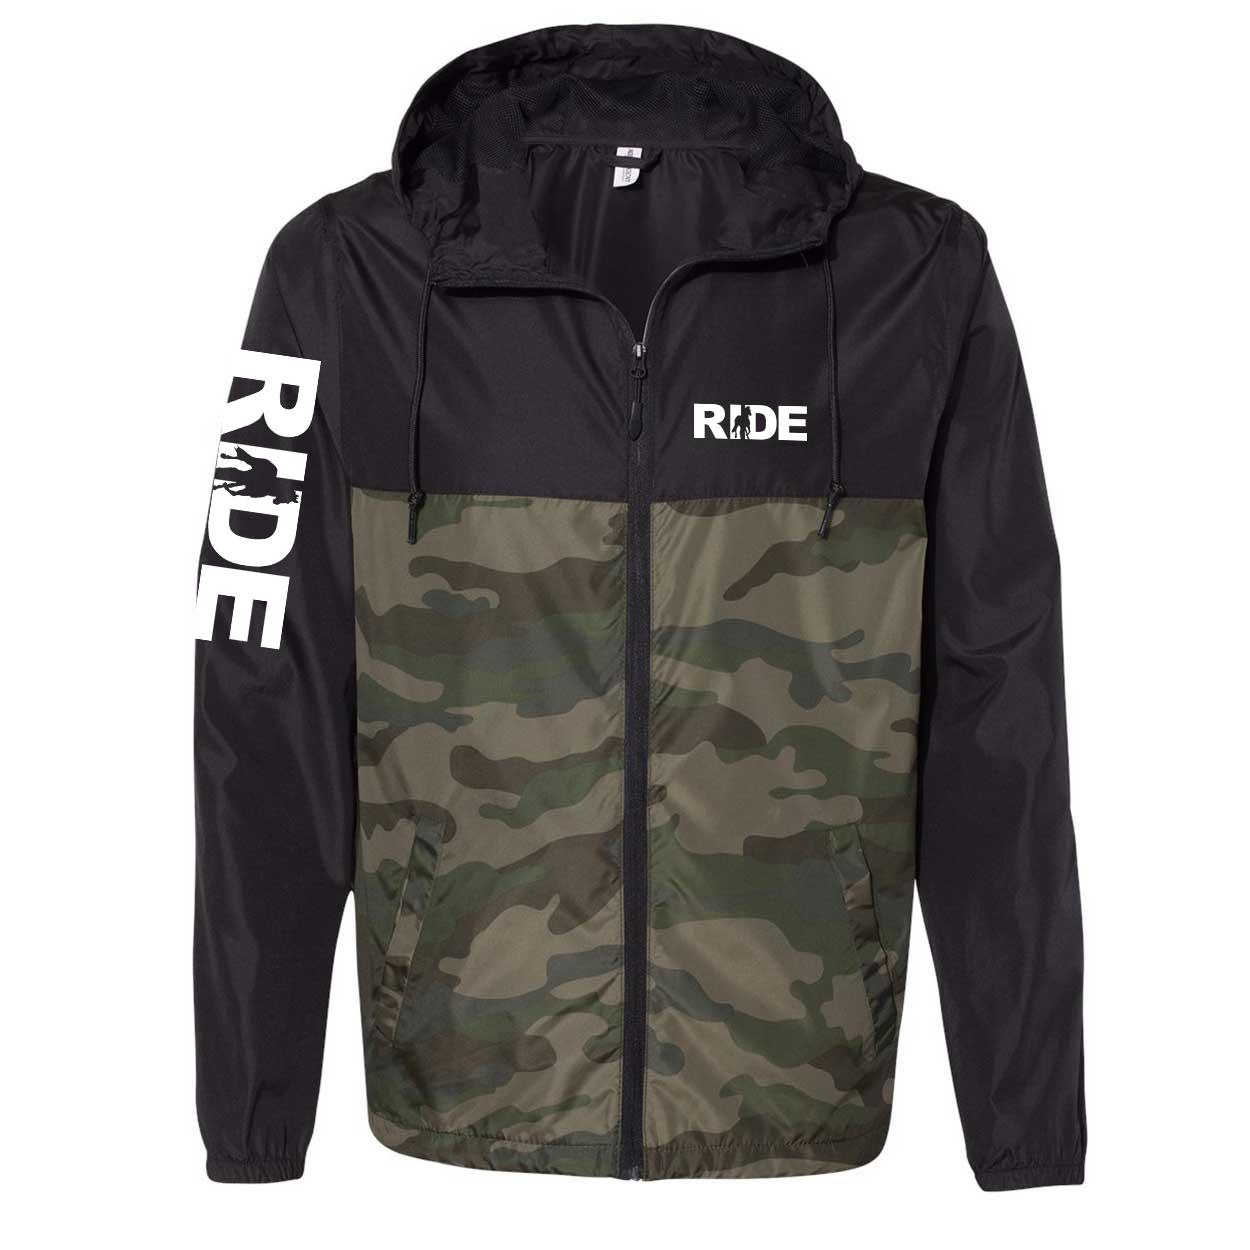 Ride Horse Logo Classic Lightweight Windbreaker Black/Forest Camo (White Logo)